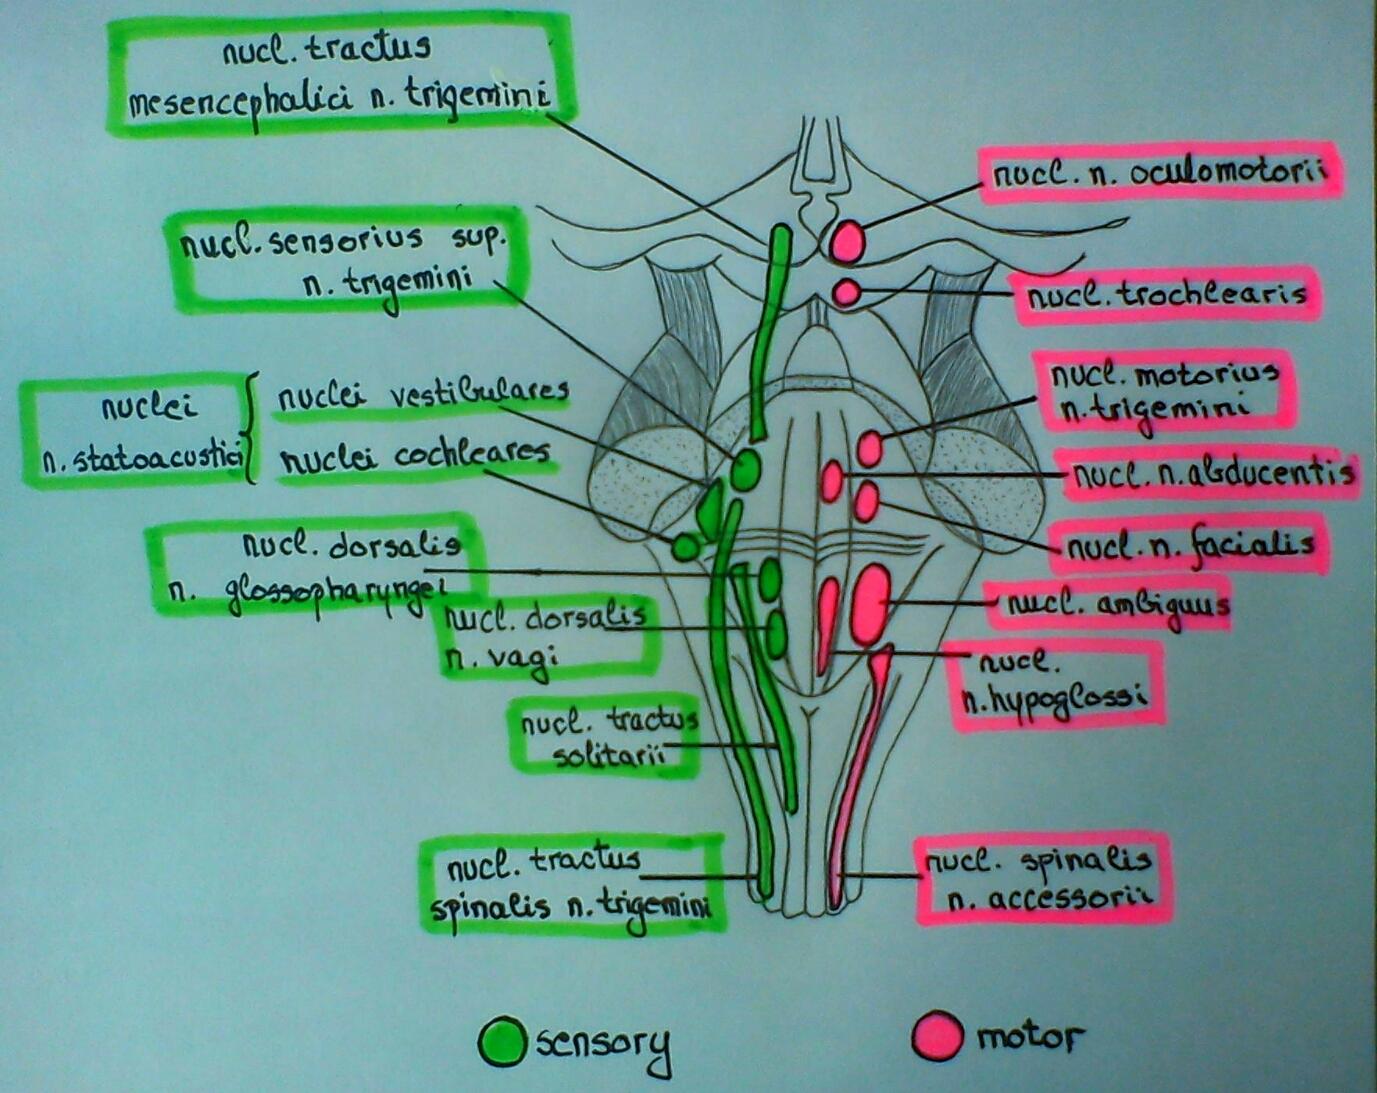 Cranial nerve nuclei in brainstem (schema)